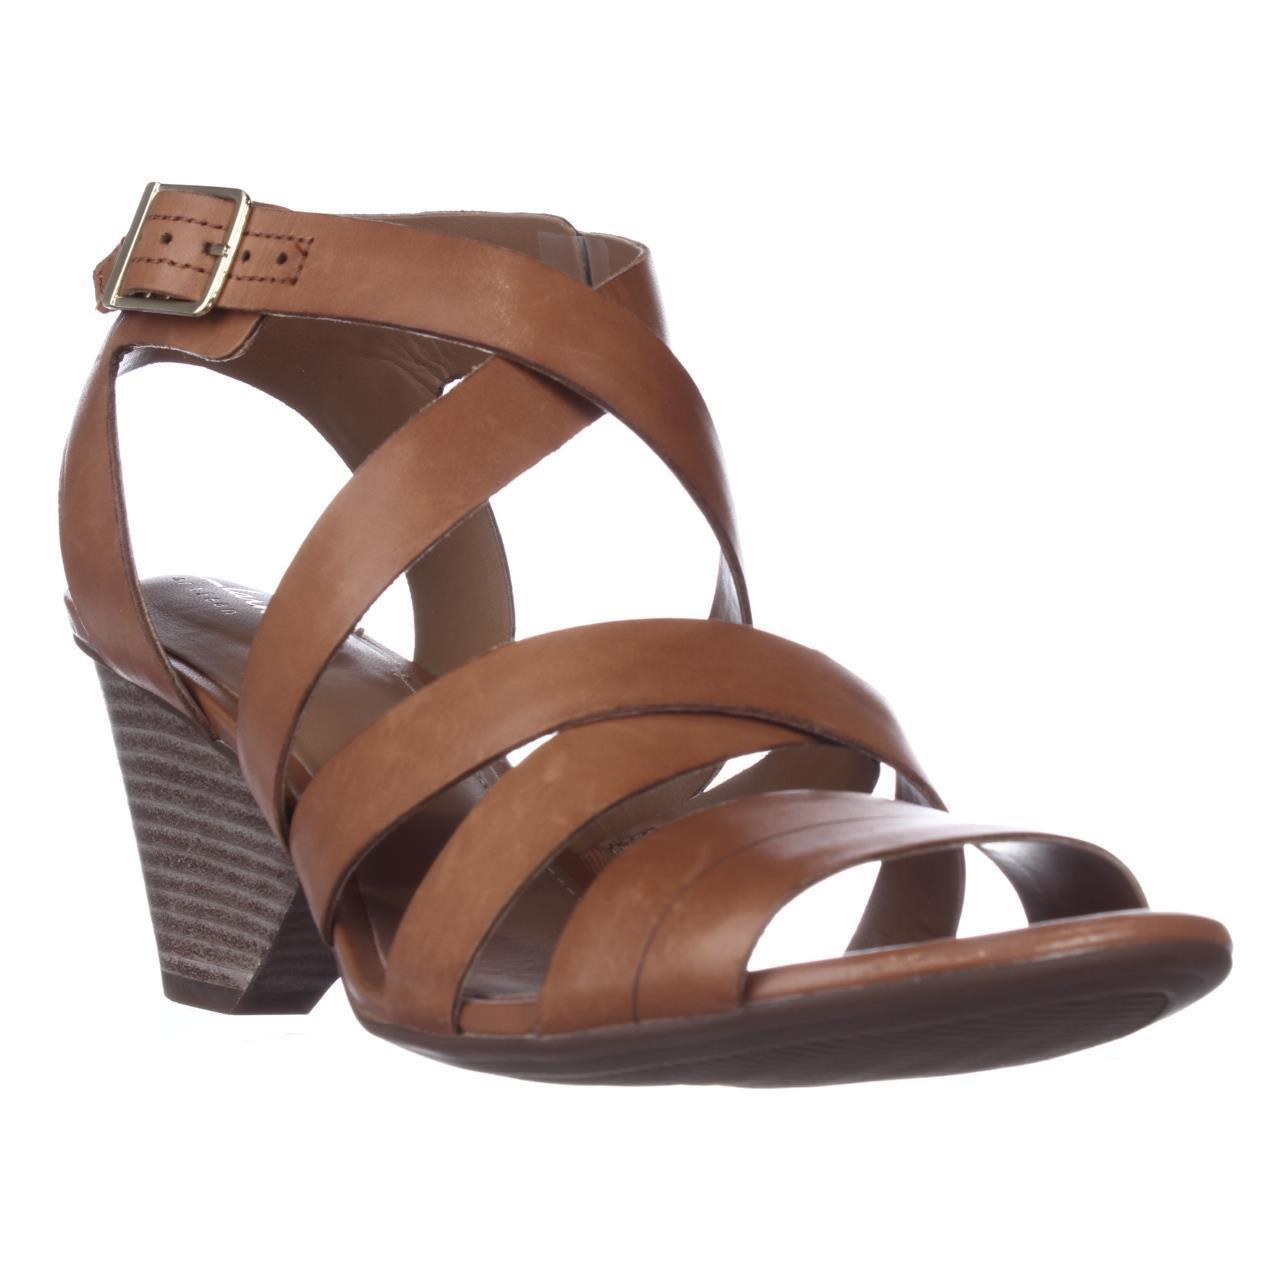 d7290e6951 Lyst - Clarks Ranae Estelle Strappy Sandals, Cognac in Brown